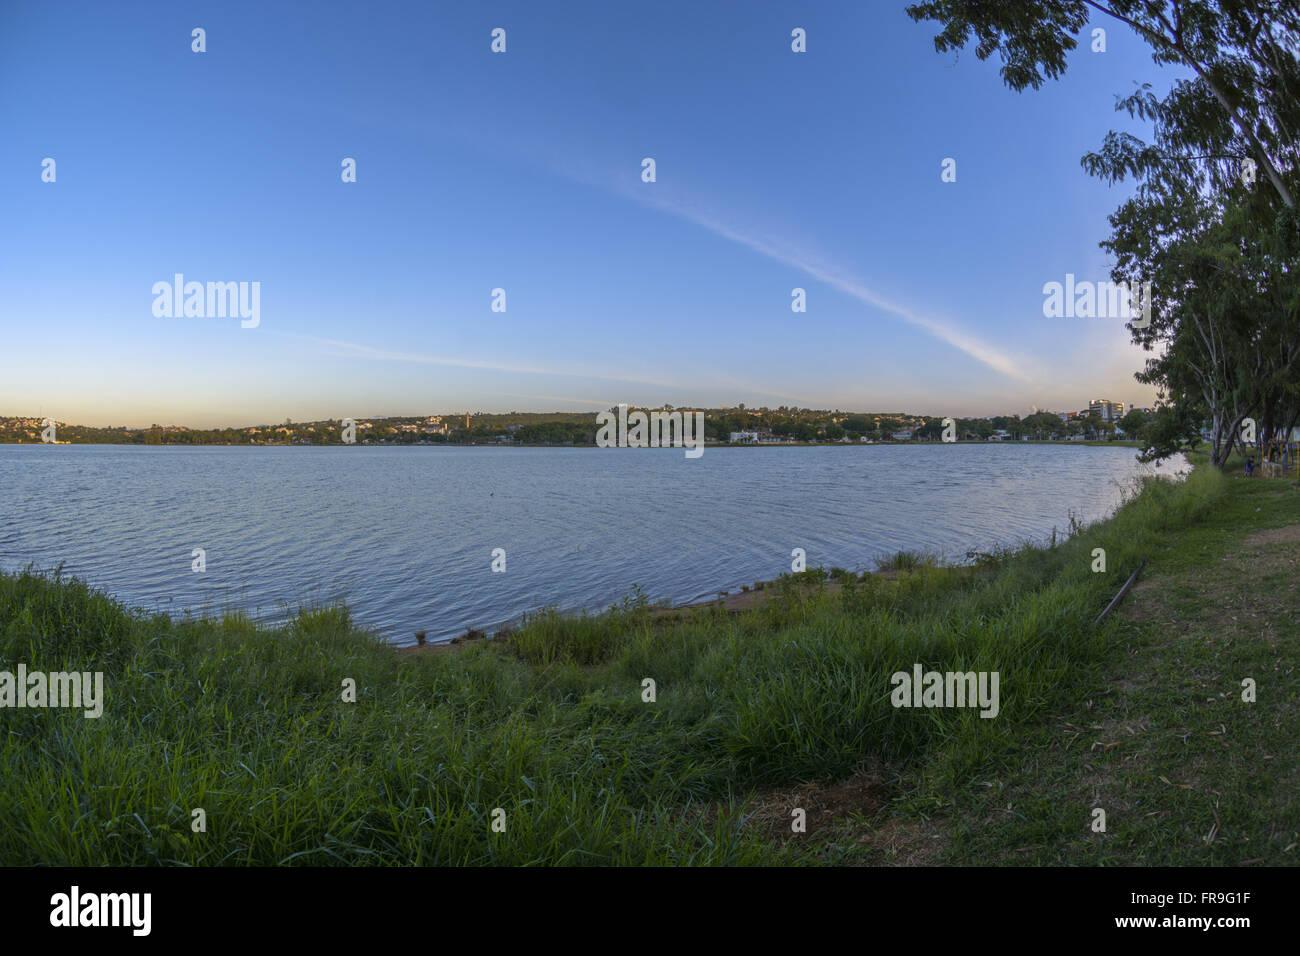 Lagoa Central na área urbana do município - Stock Image